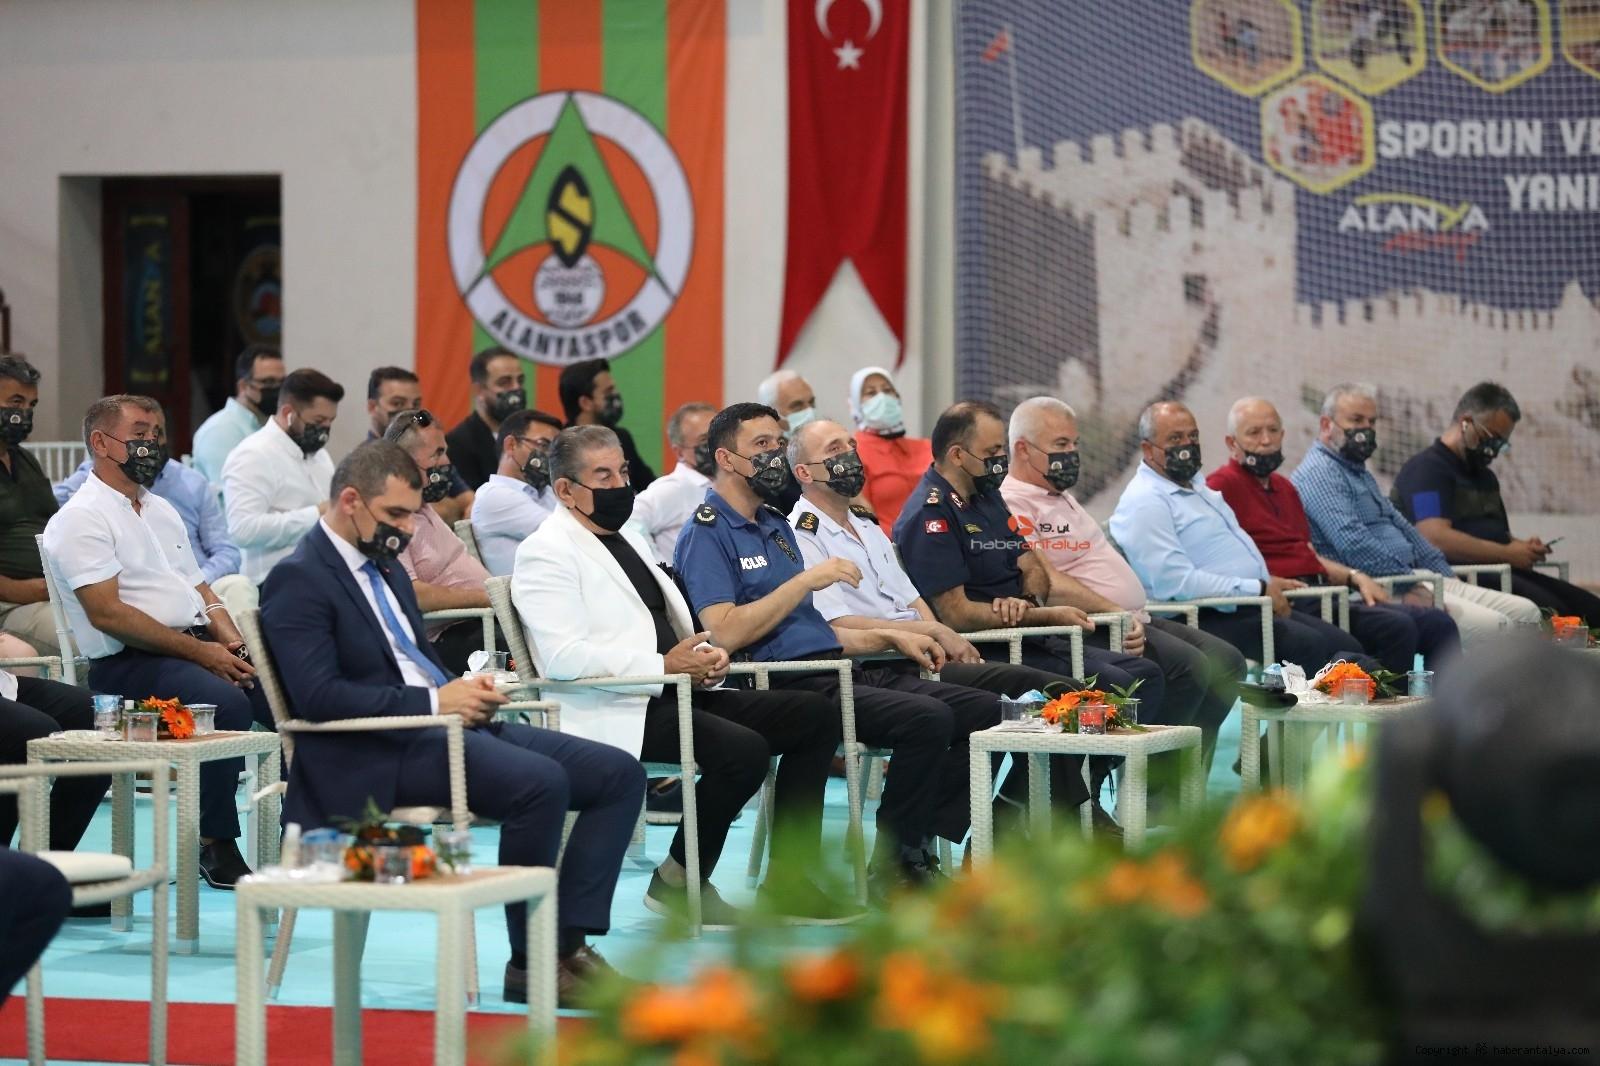 2021/06/alanyasporda-hasan-cavusoglu-guven-tazeledi-20210609AW34-9.jpg